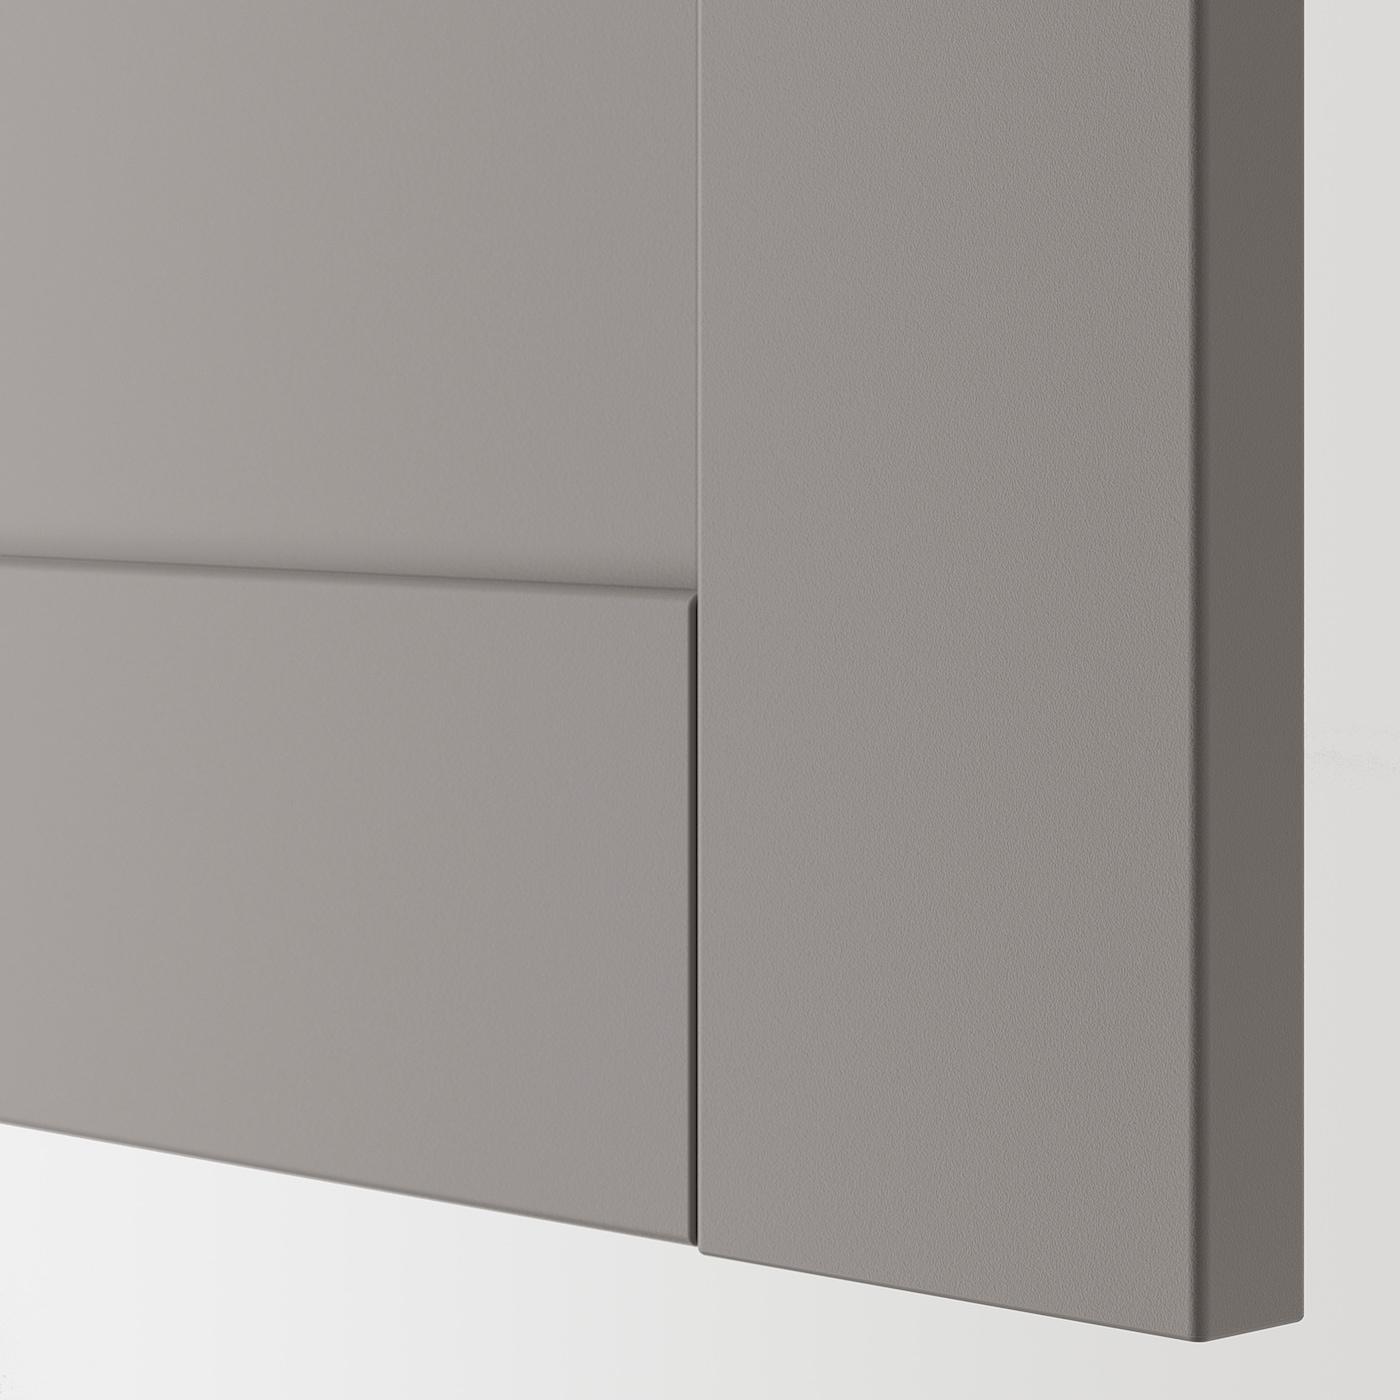 ENHET خزانة حائط مع رفين/باب, رمادي/أبيض, 40x17x75 سم